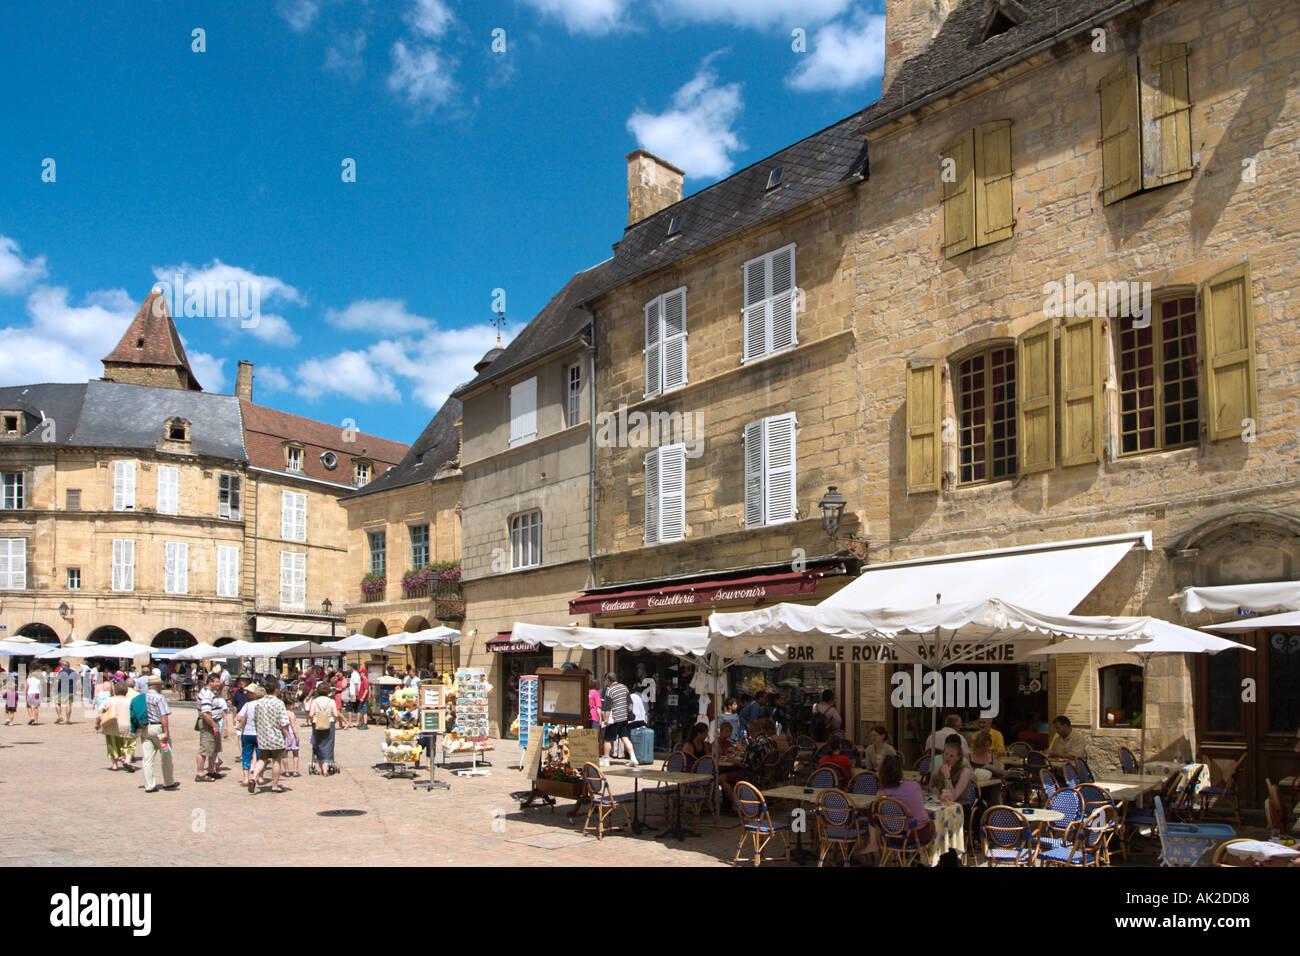 Cafe in the Place de la Liberte in the centre of the Old Town, Sarlat, Perigord Noir, Dordogne, France Stock Photo